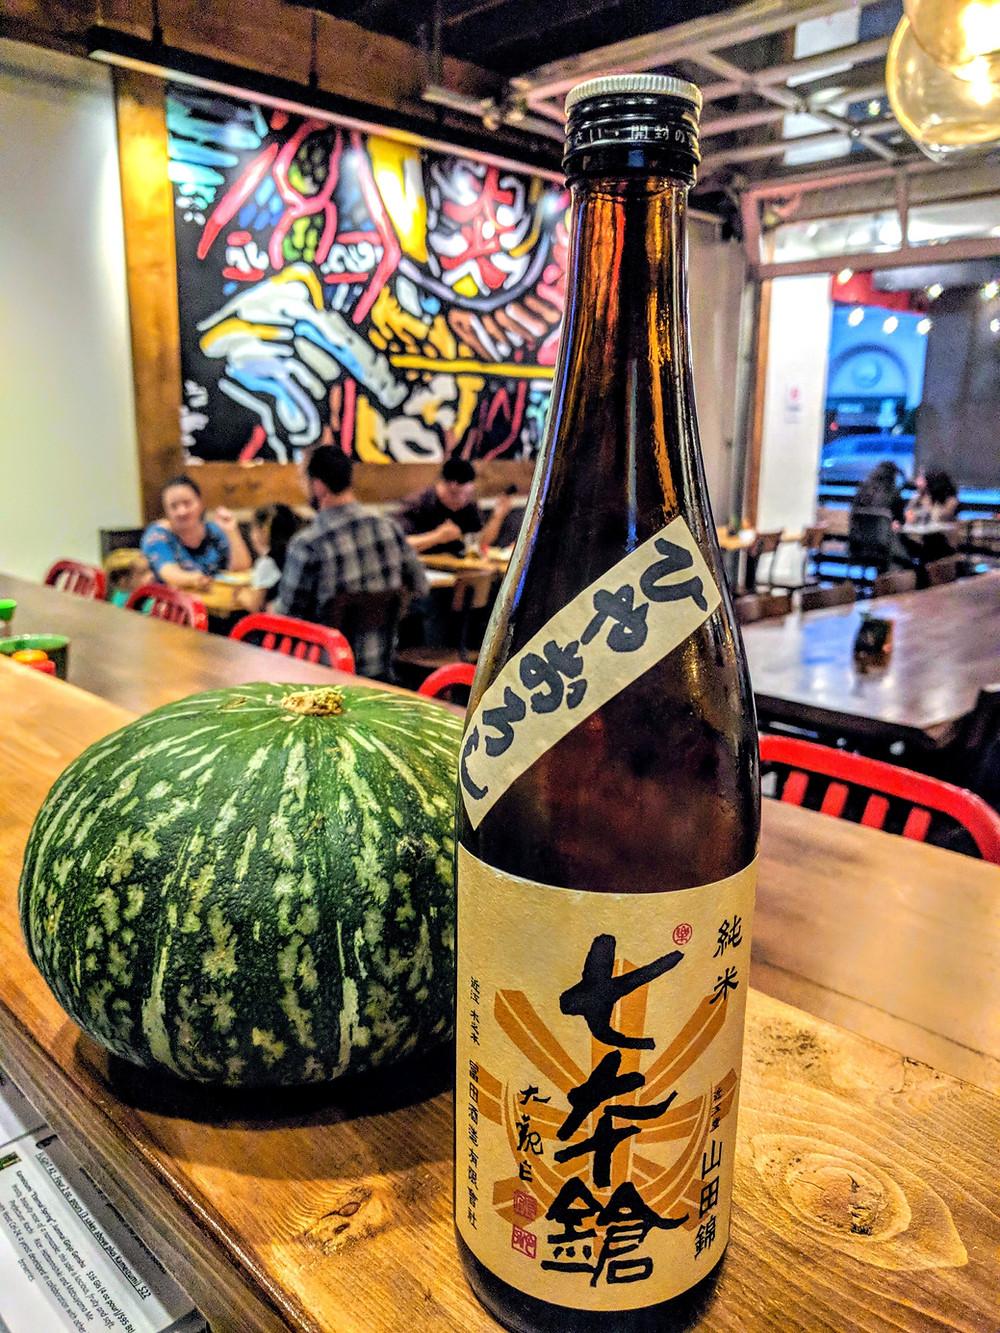 Bottle of Shichi Hon Yari Autumn Seasonal Sake with Kabocha Pumpkin at a Japanese Restaurant